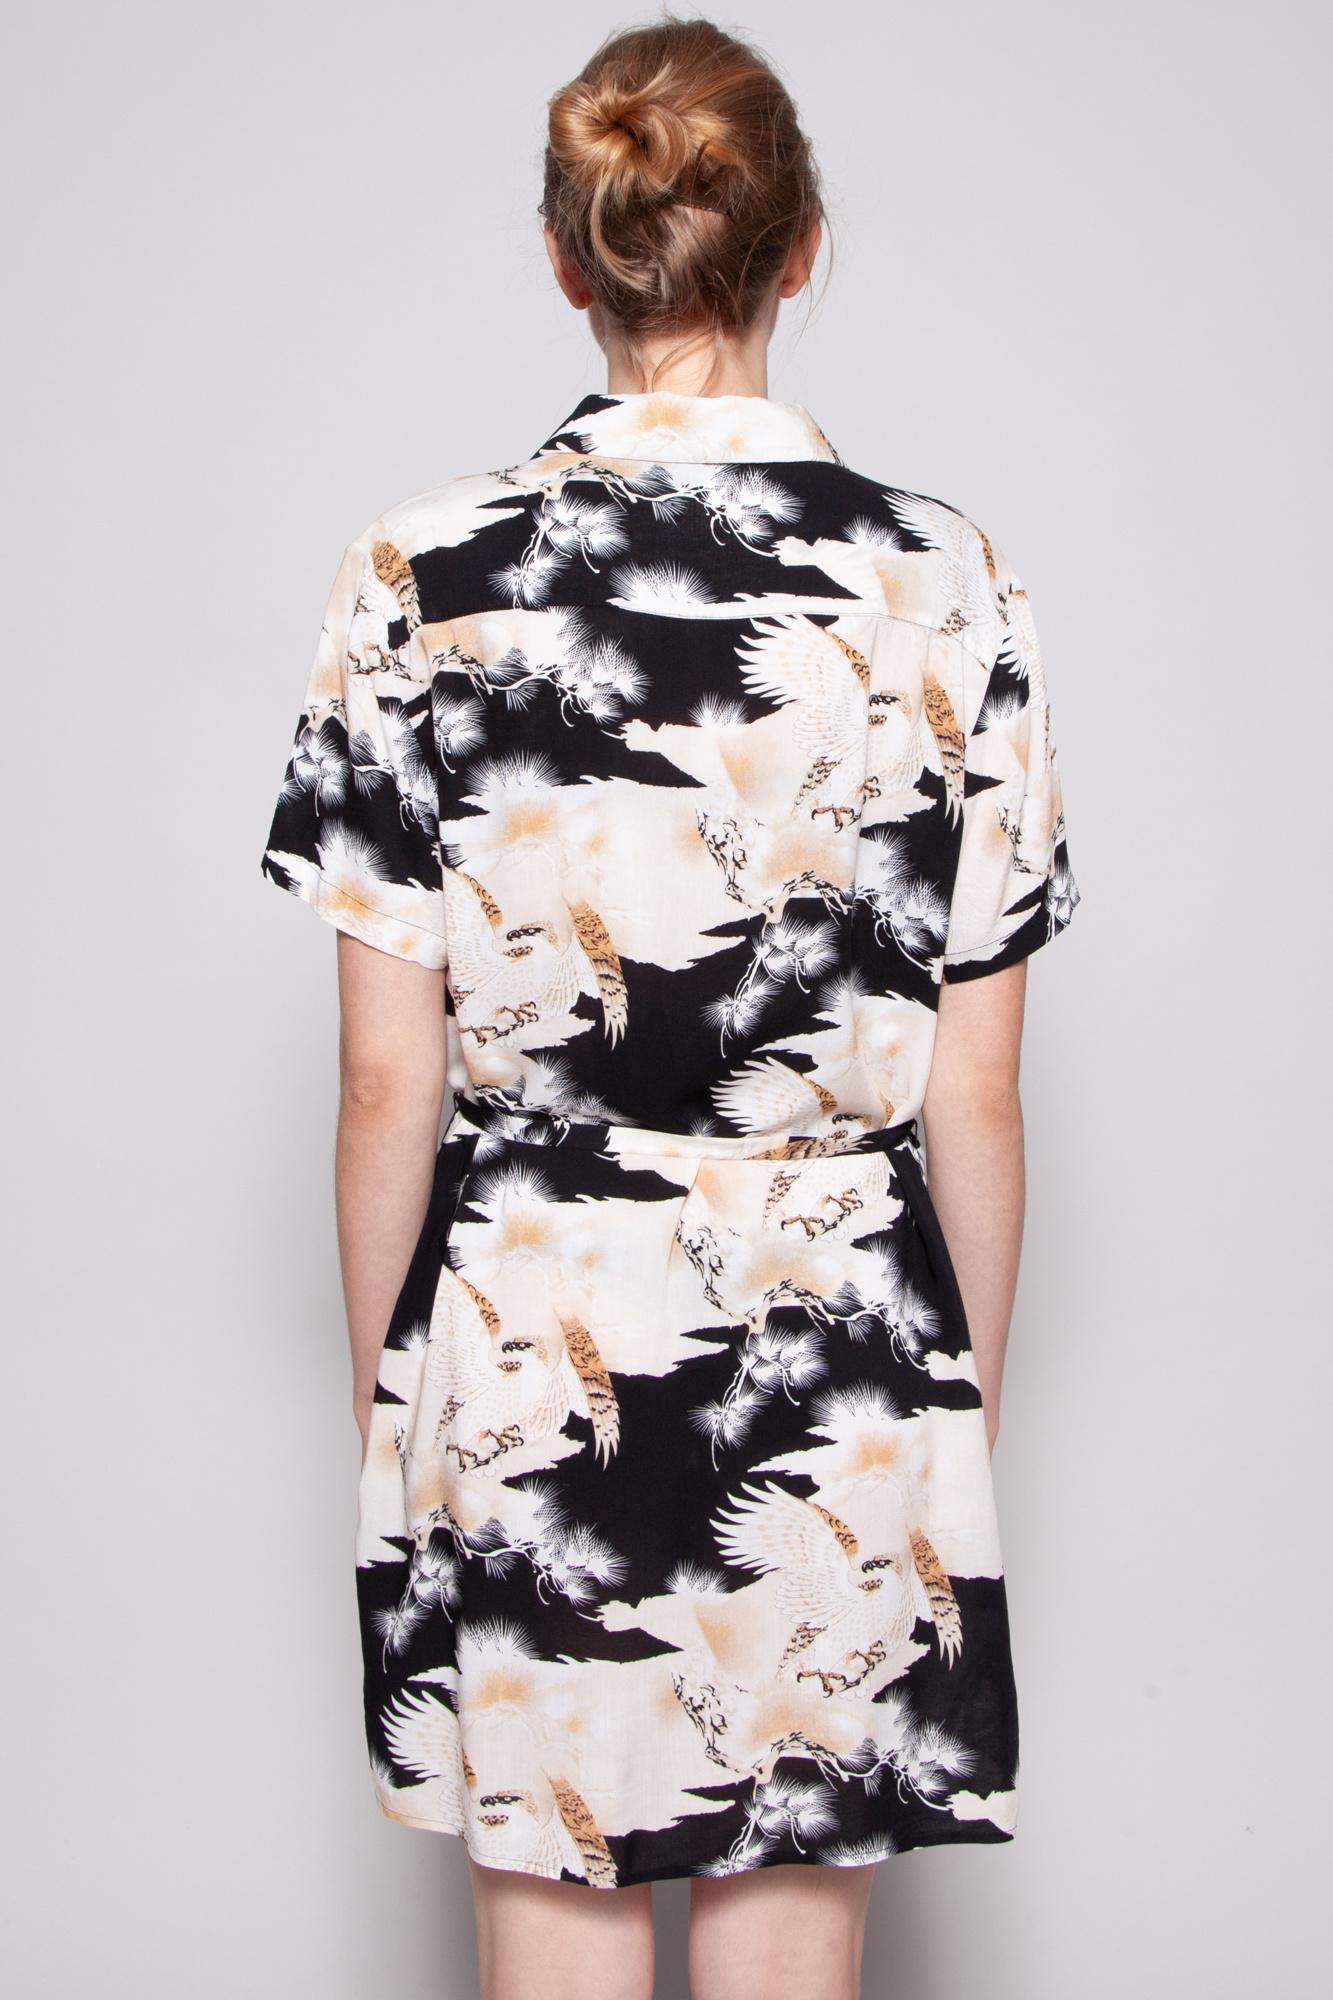 AllSaints PINK AND BLACK EAGLE PRINT SHIRT DRESS